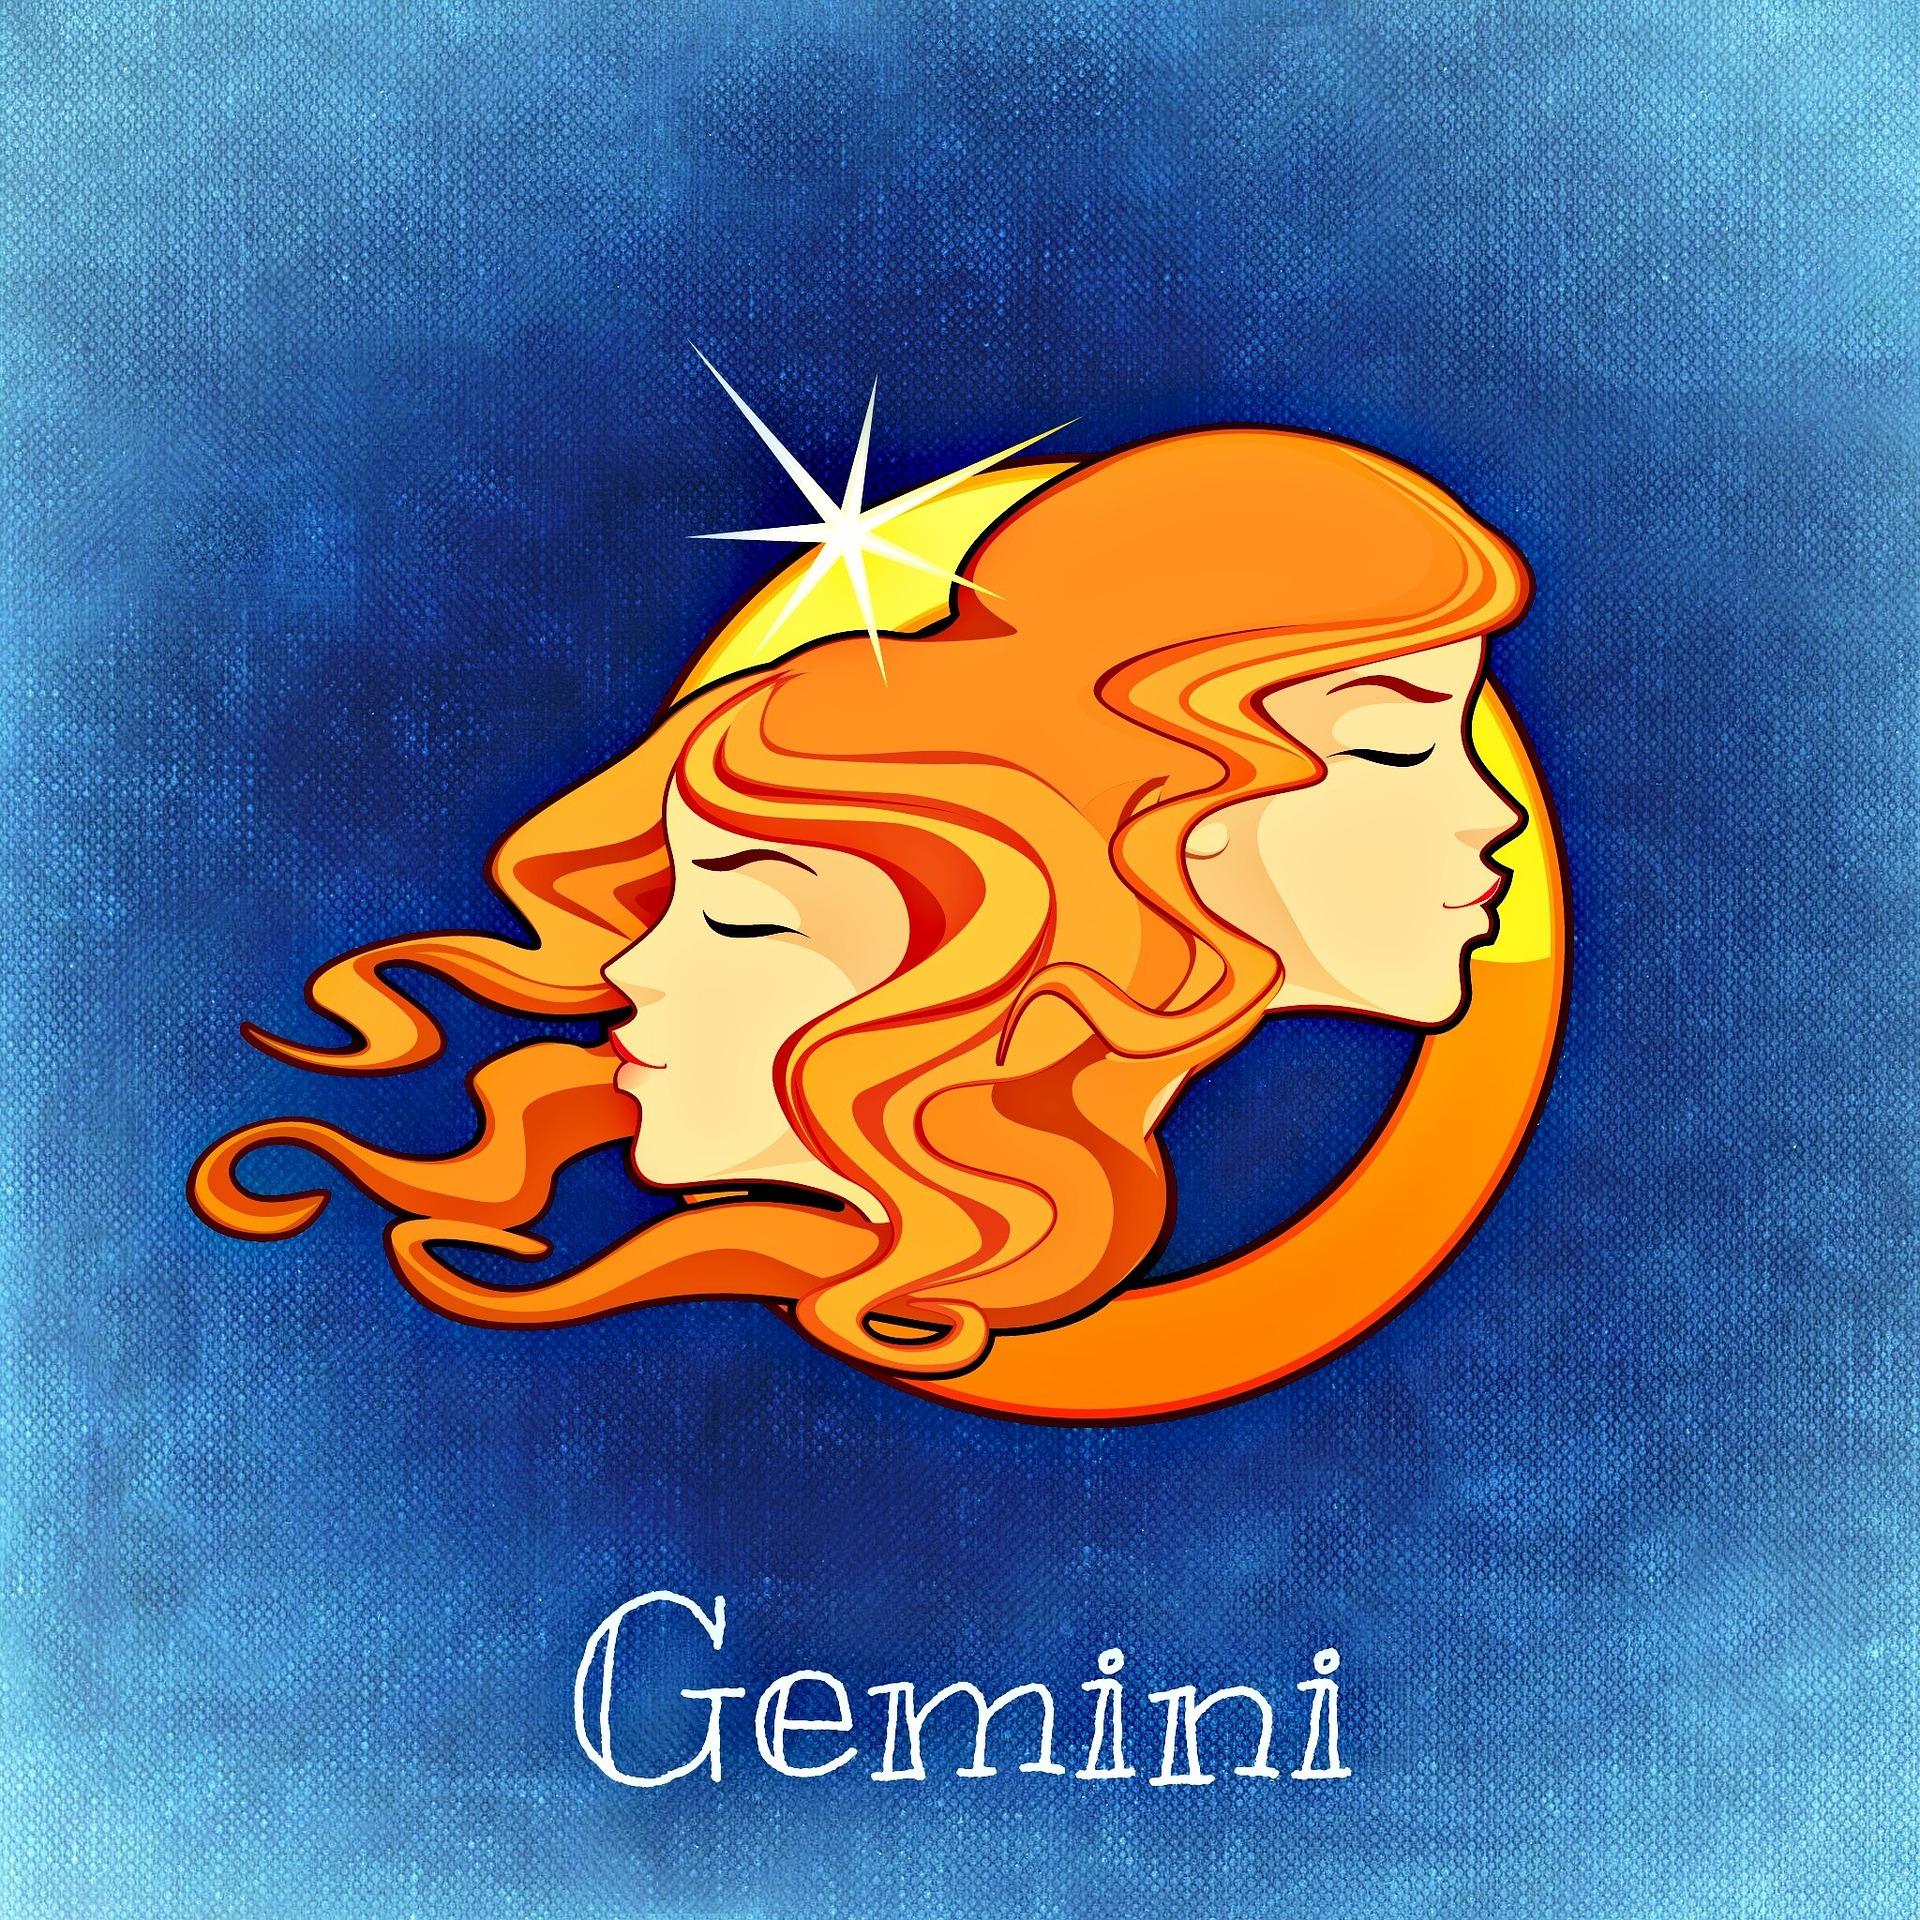 Gemini 双子座